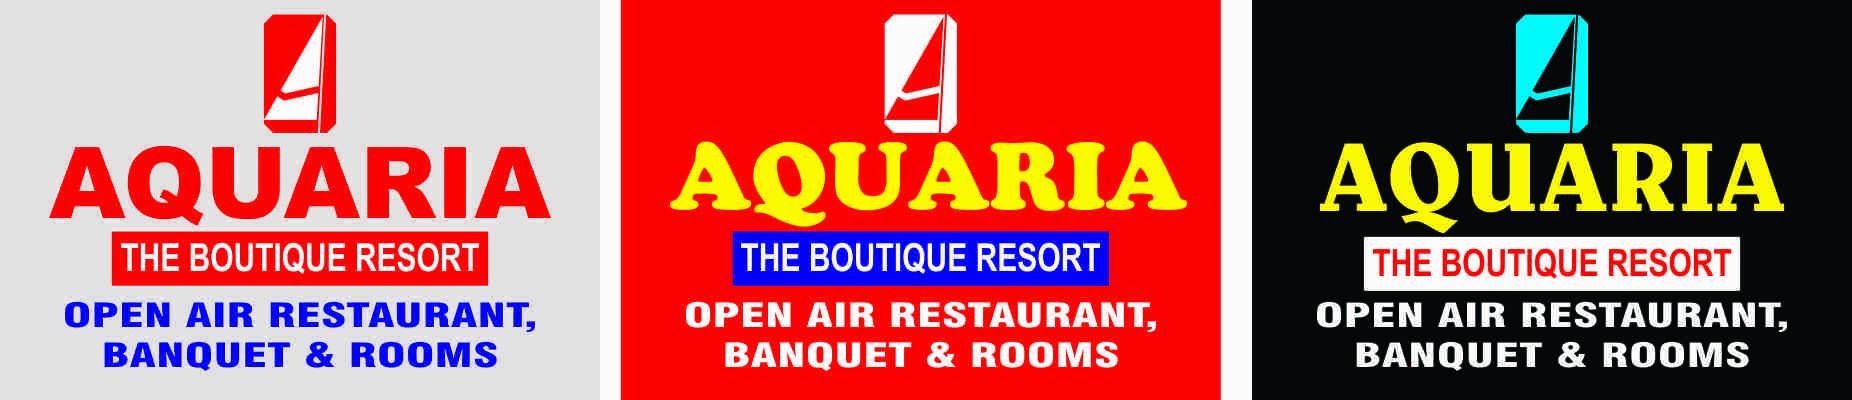 Aquaria the Boutique Resort